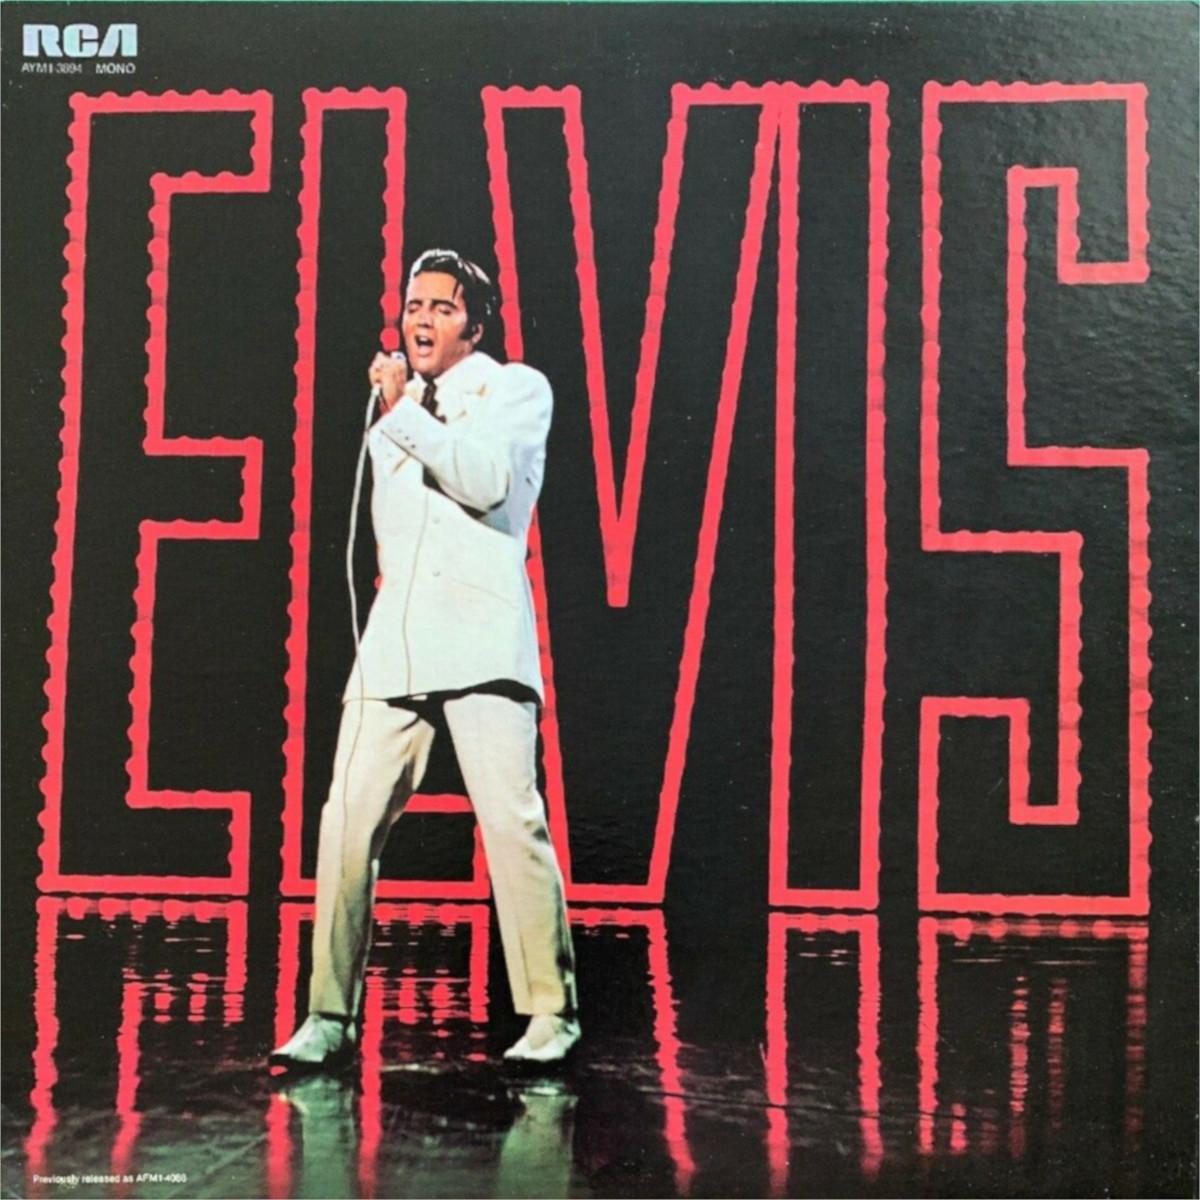 ELVIS  Aym1-3984-81-1vhkui